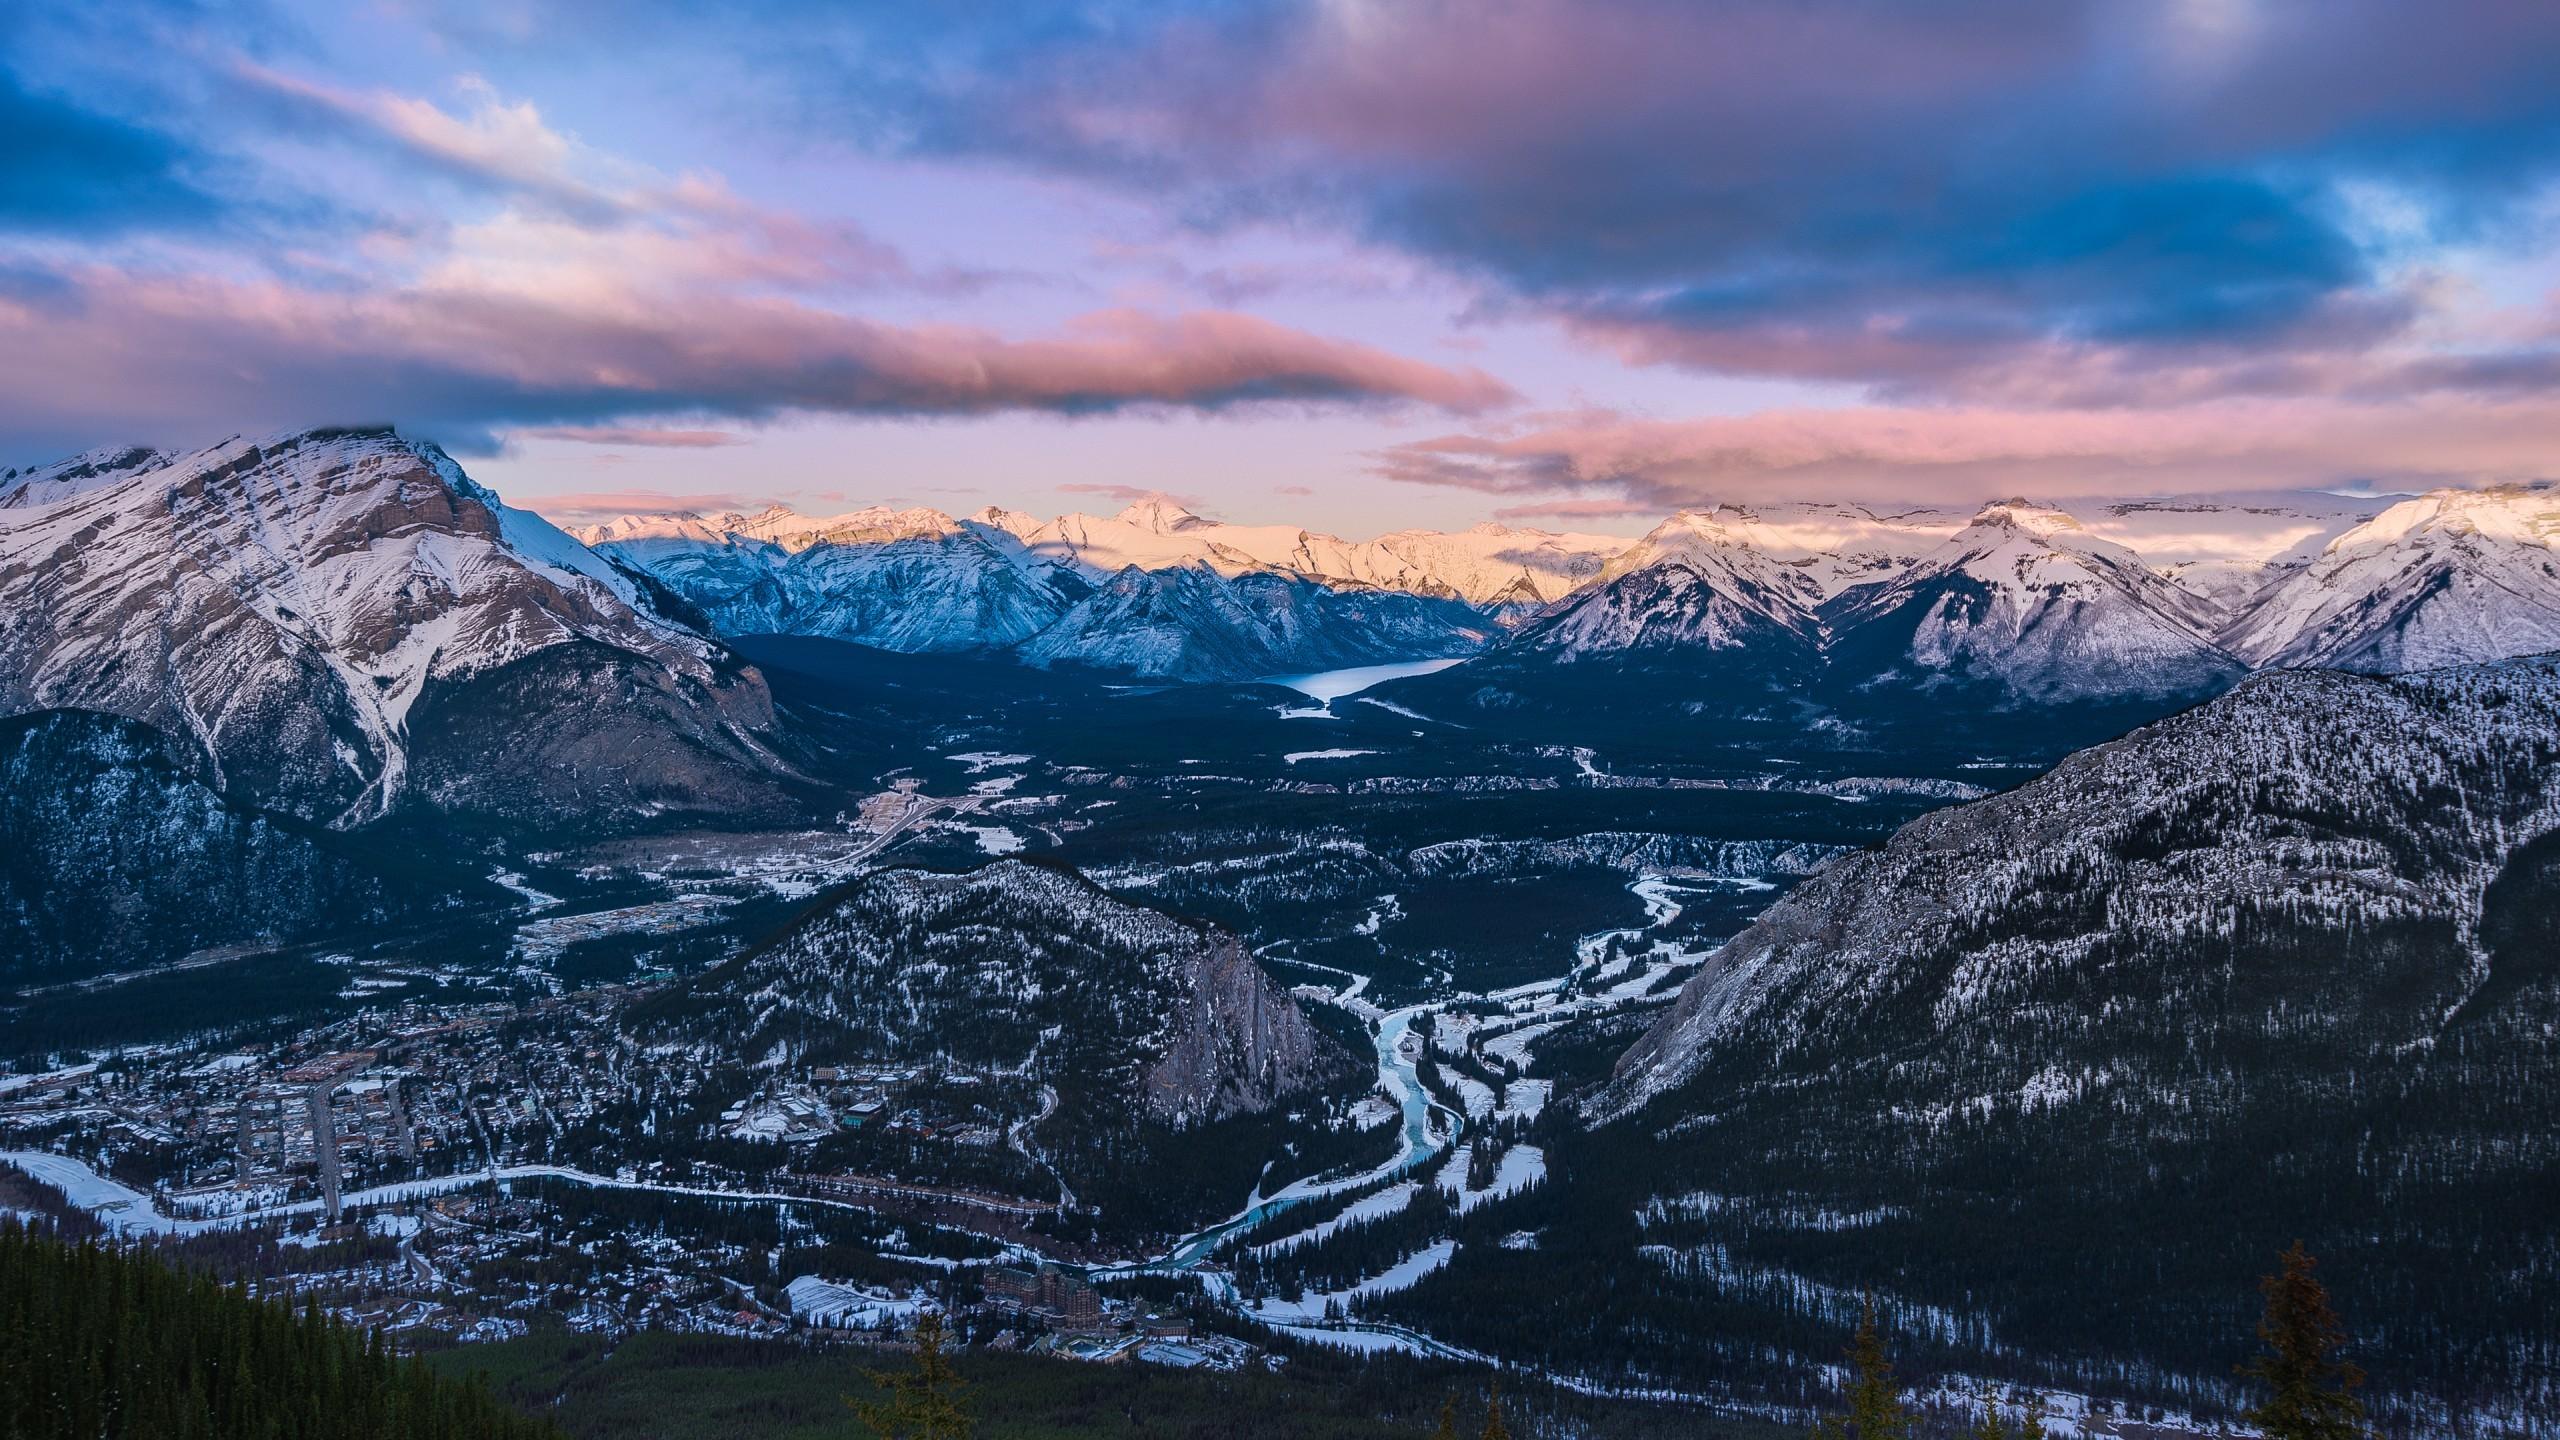 4K Mountain Wallpaper (37+ images)